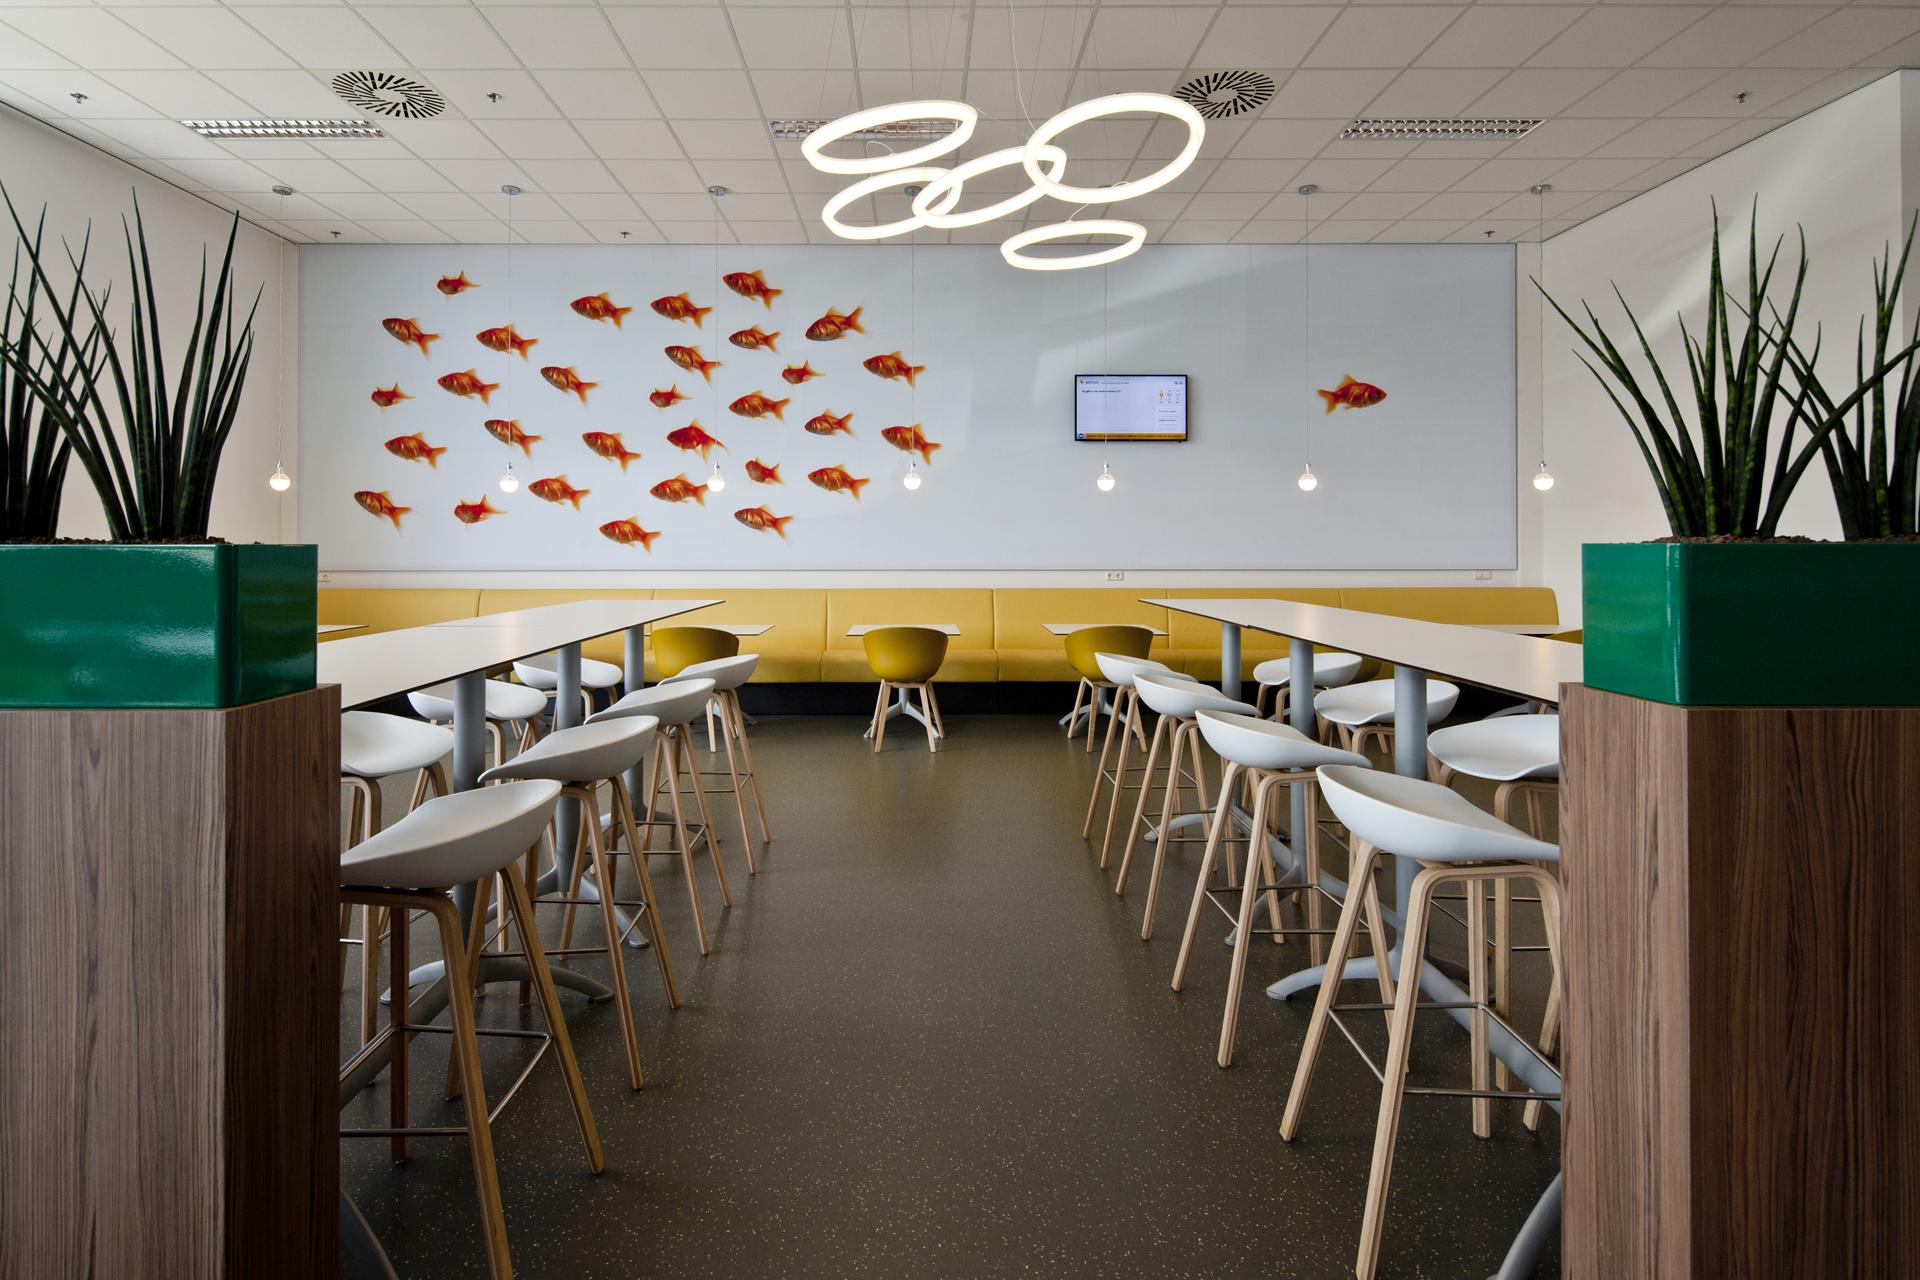 2210 restaurant